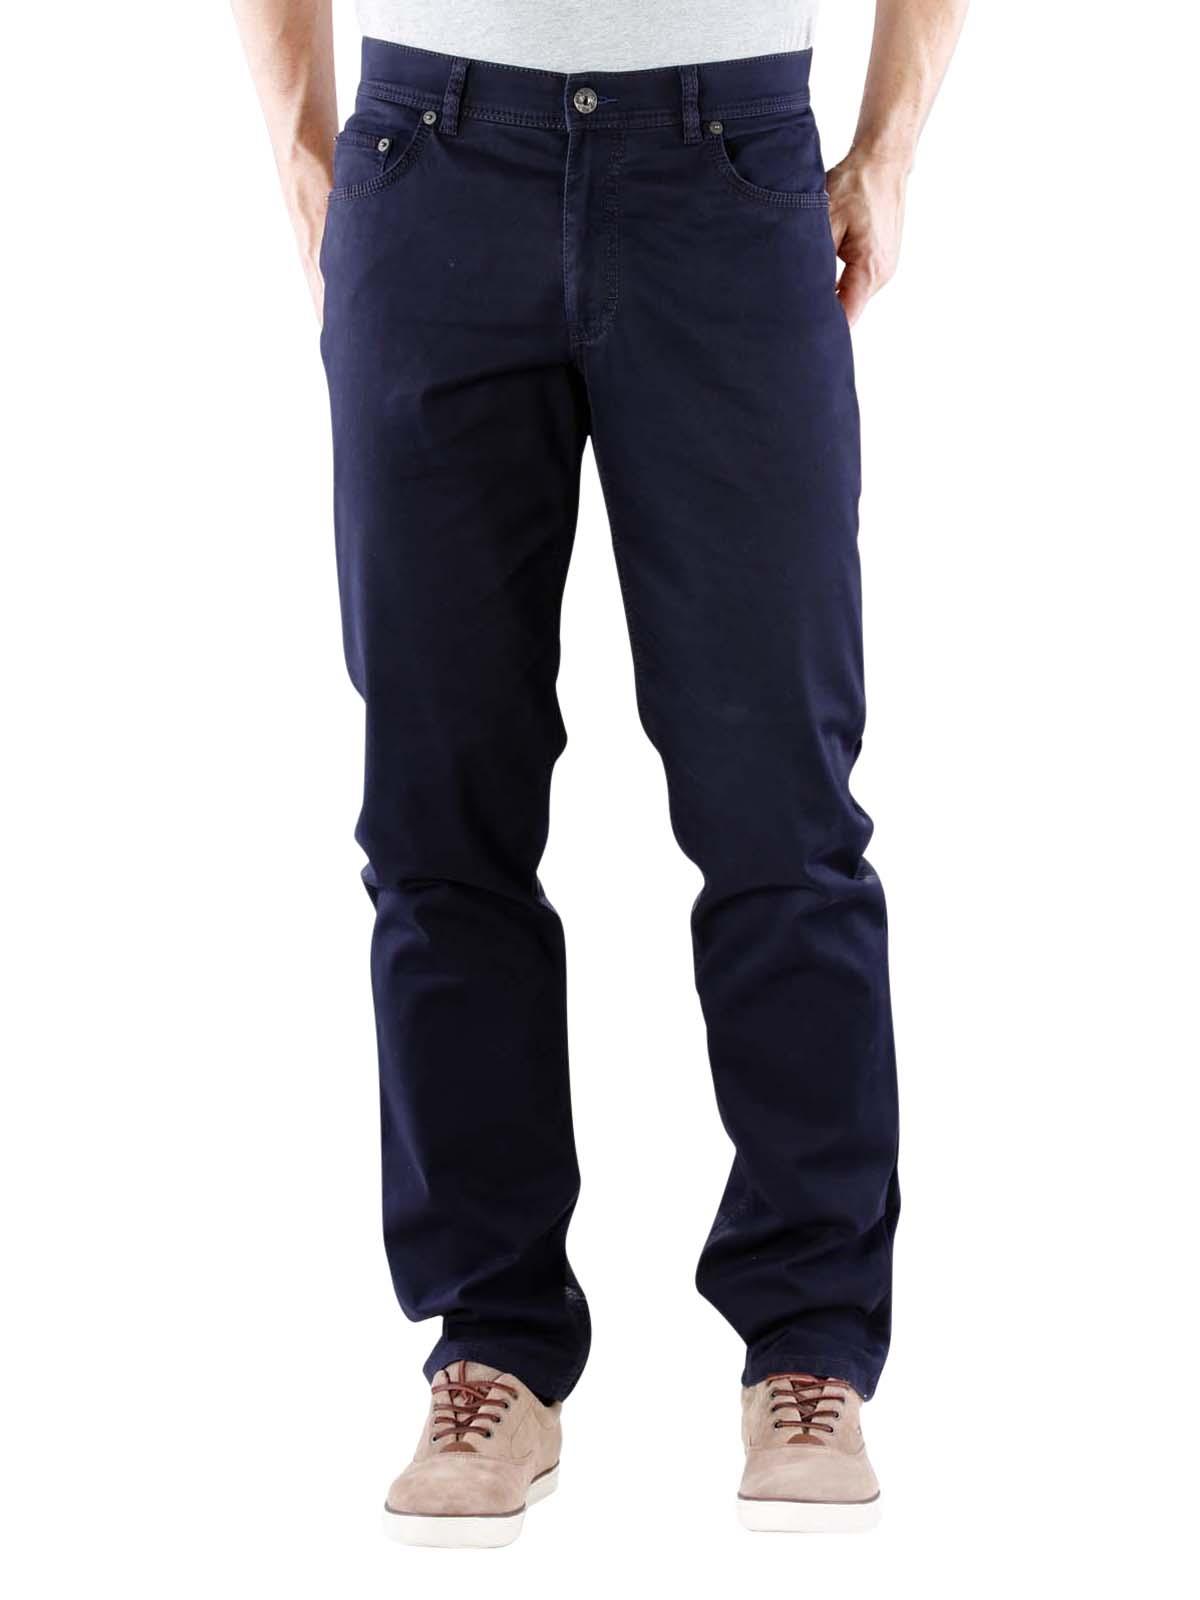 unique design popular stores new images of Brax Cooper Pant Straight Fit perma blue